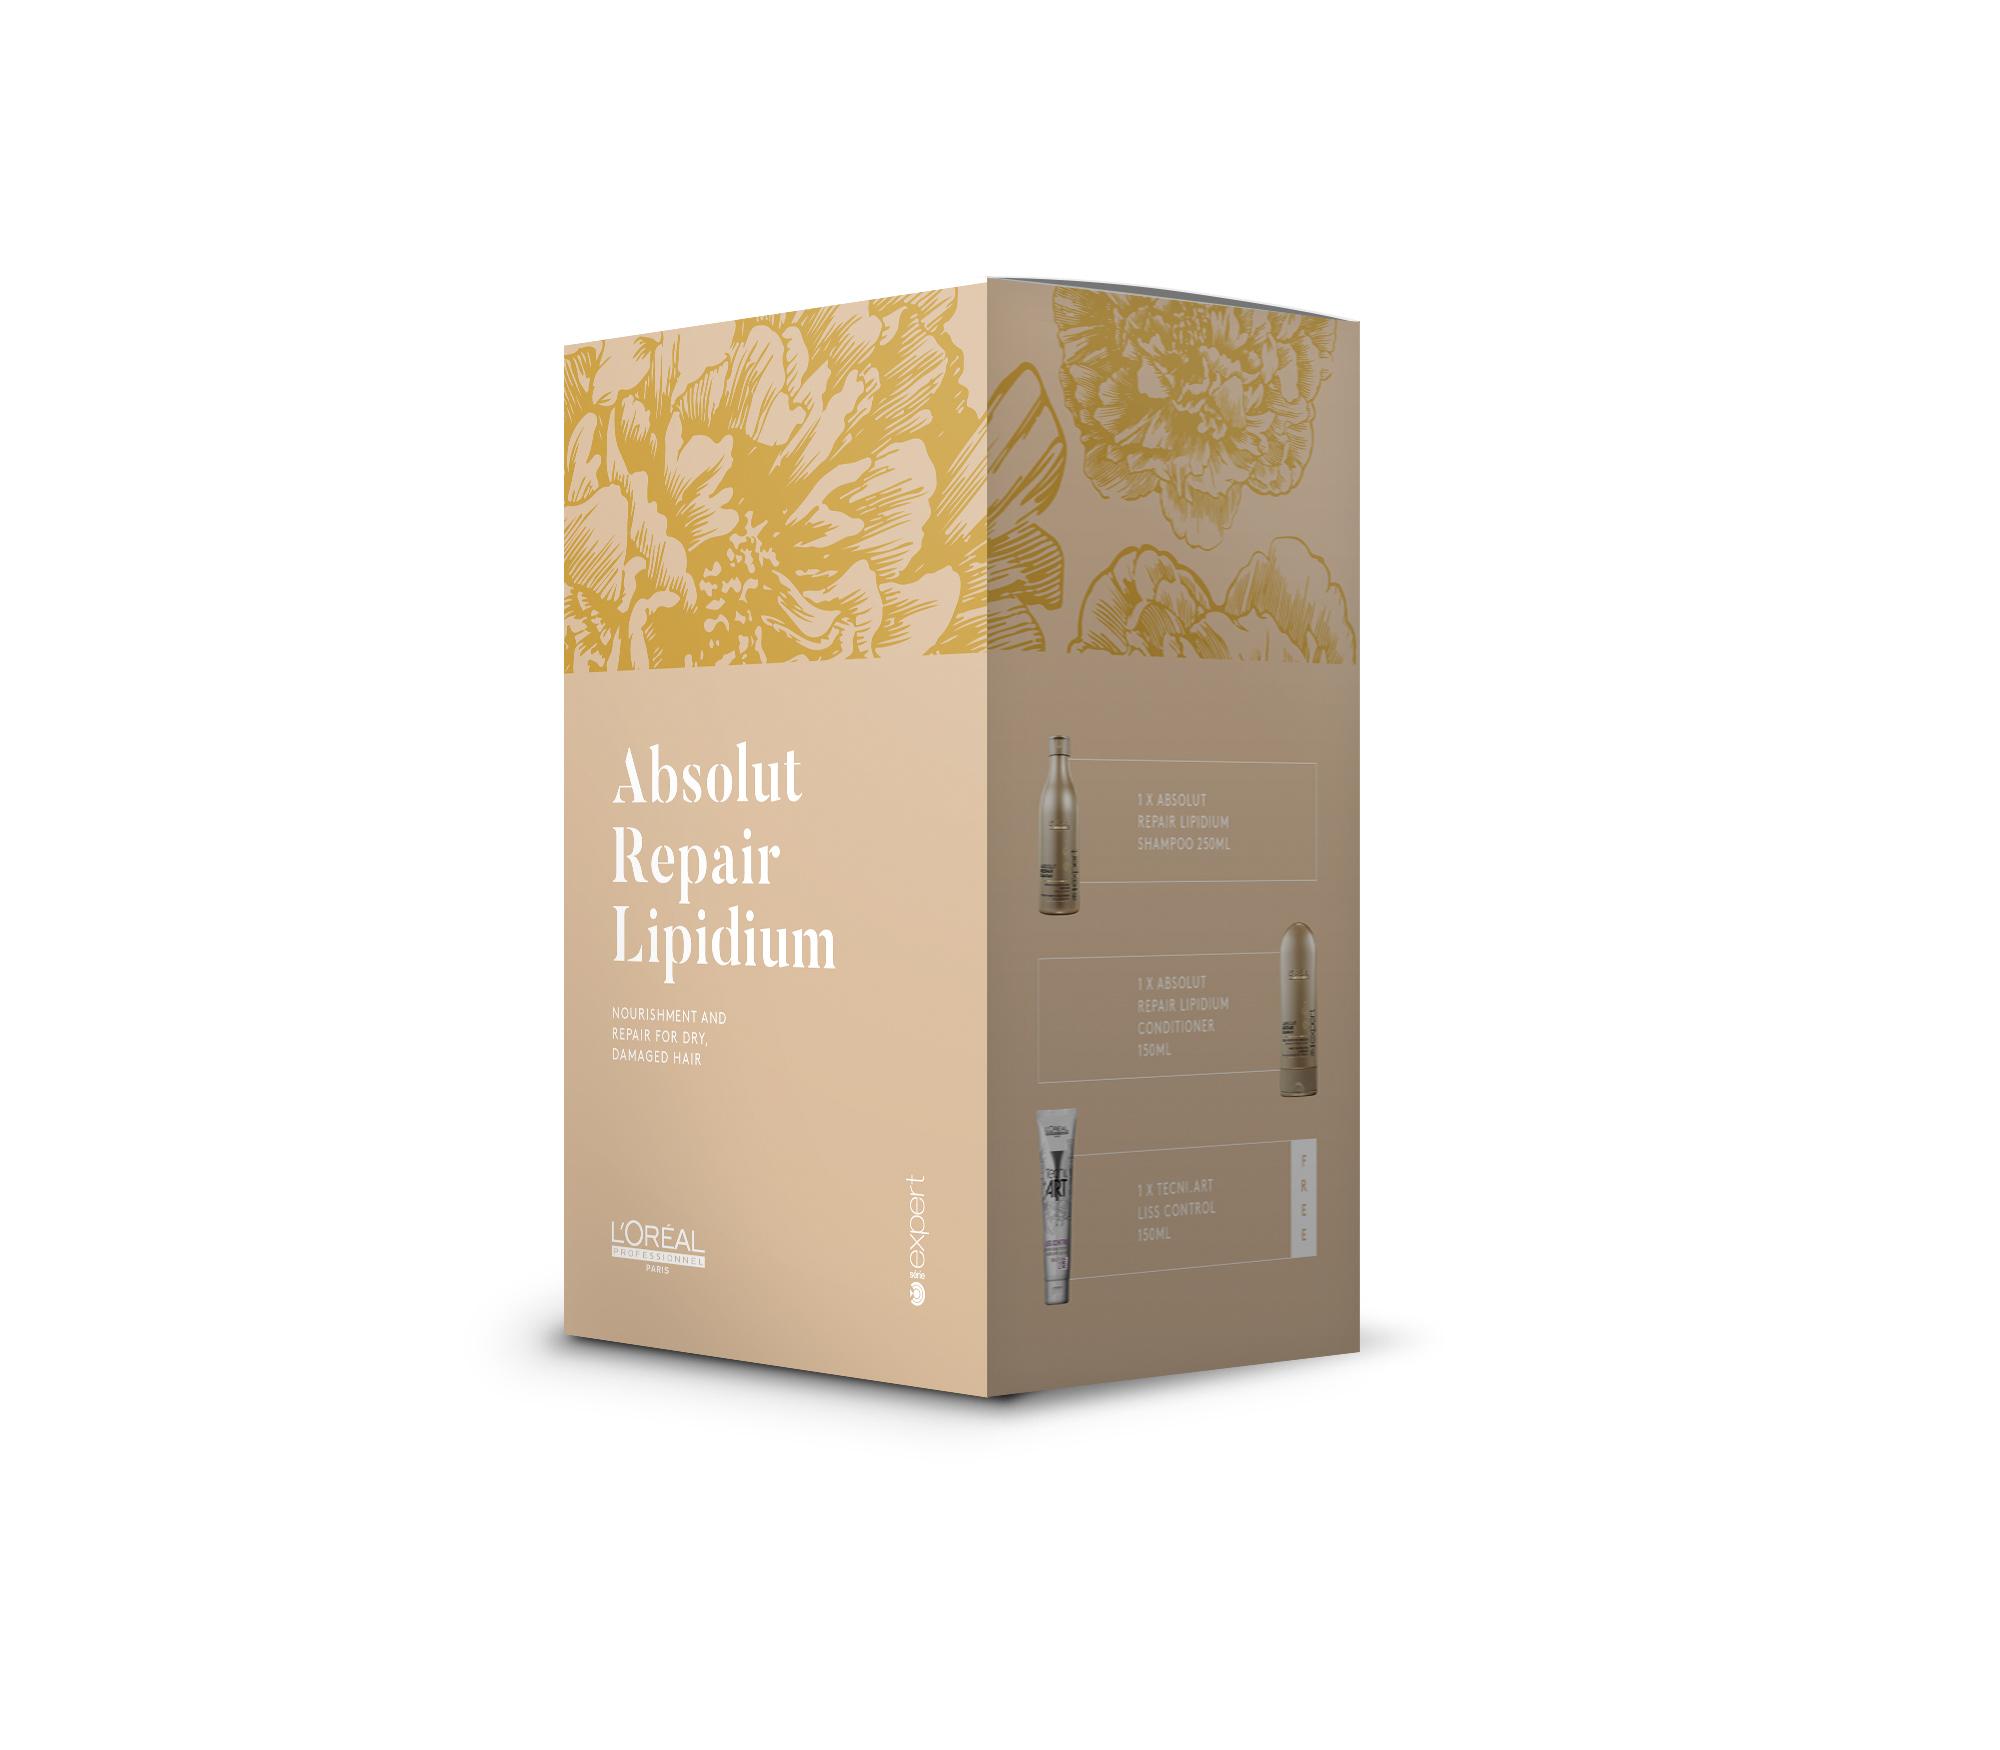 loreal-professionnel-absolut-repair-lipidium-christmas-pack-rrp59-00